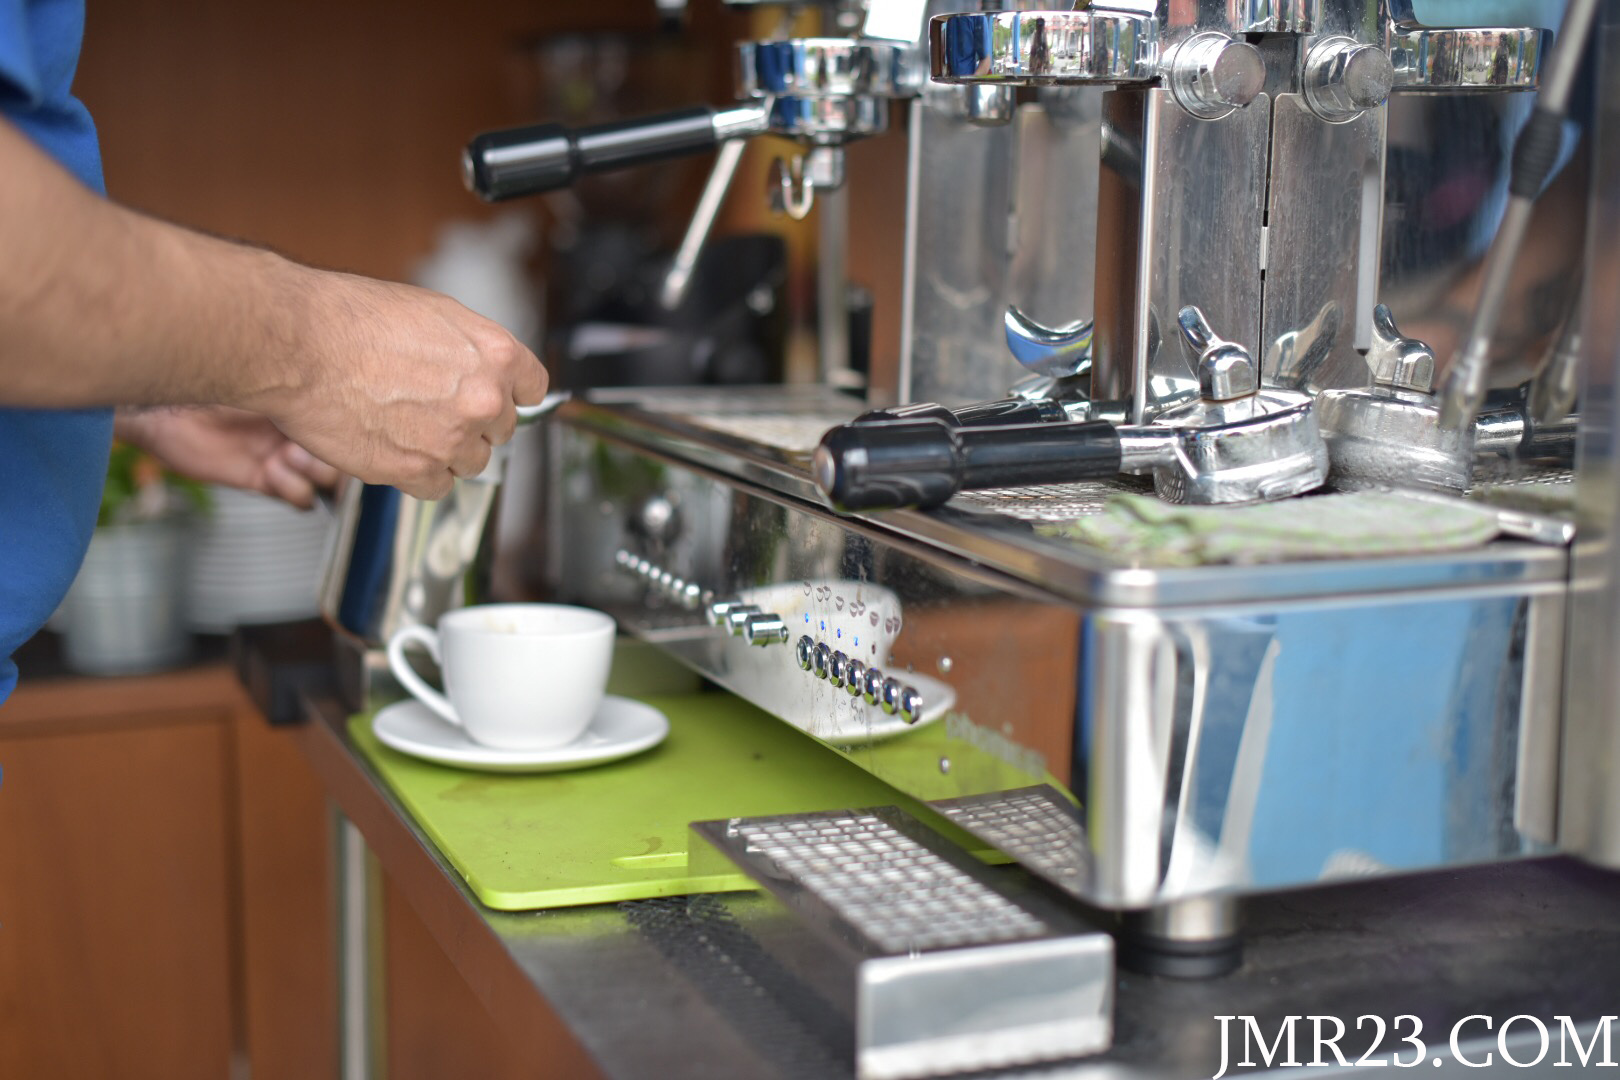 COFFEE MAKER PASTA EXPRESS